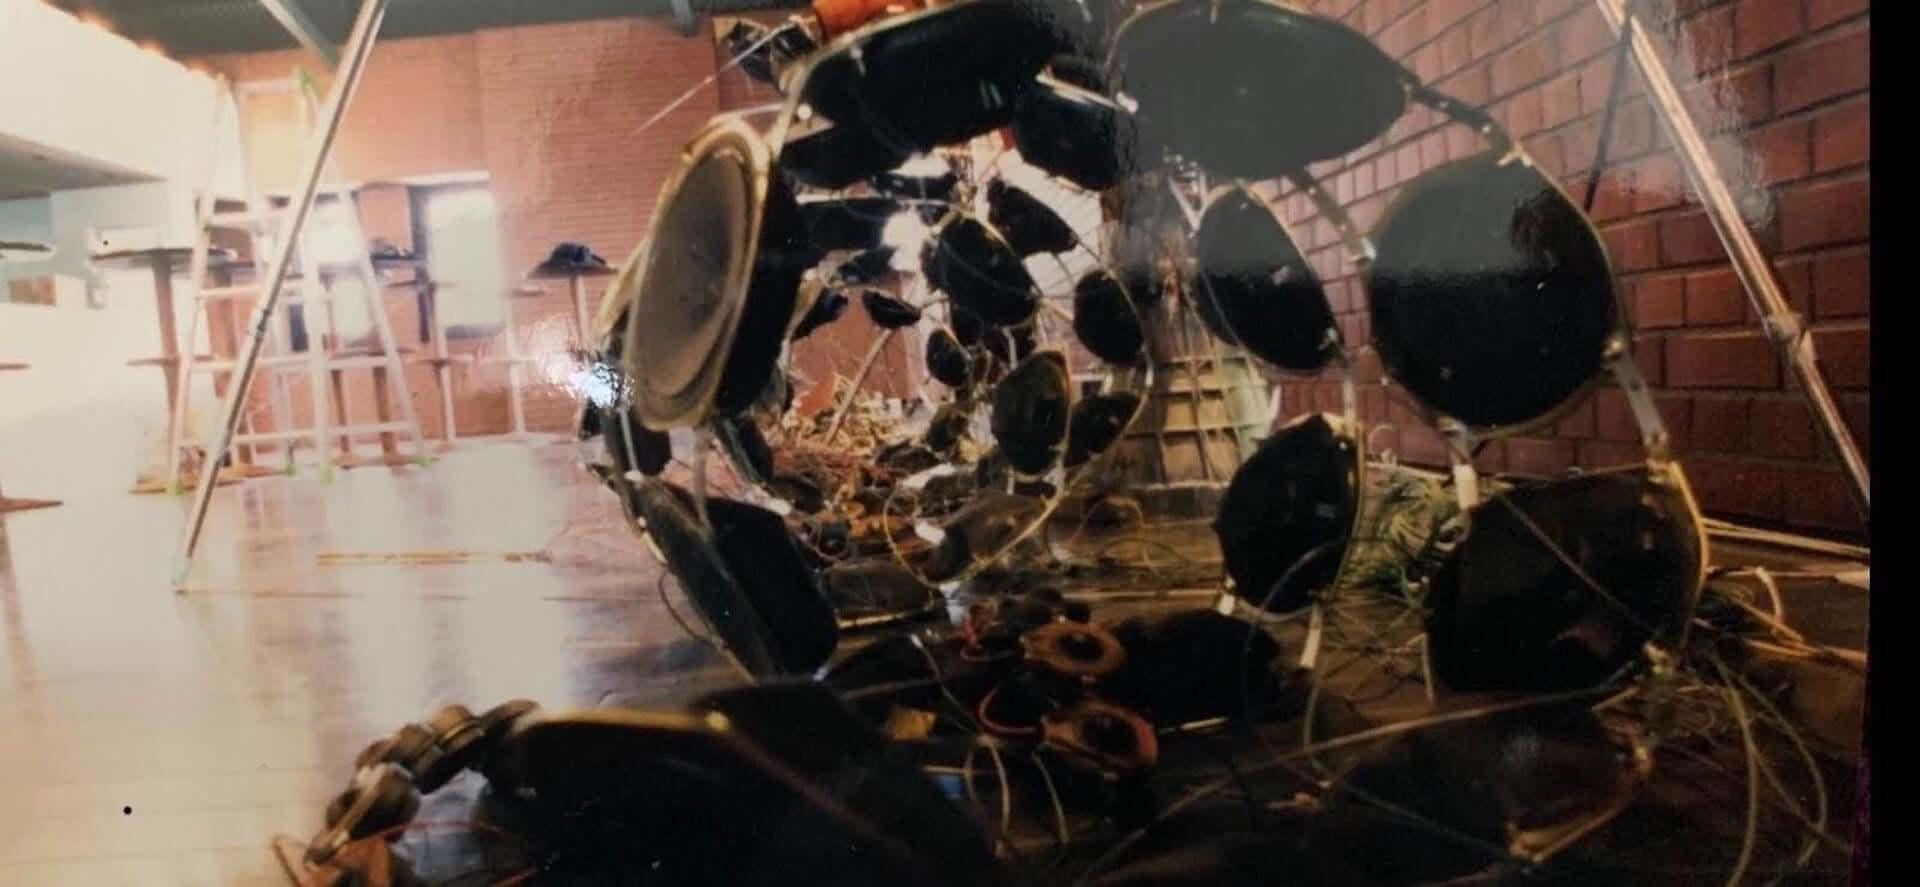 <MUSO Culture Festival>のメイン会場がバーチャル大中寺に変更!Kaoru Inoue、ELLI ARAKAWAらのスペシャルミックスも公開決定 music210129_muso-festival_10-1920x887